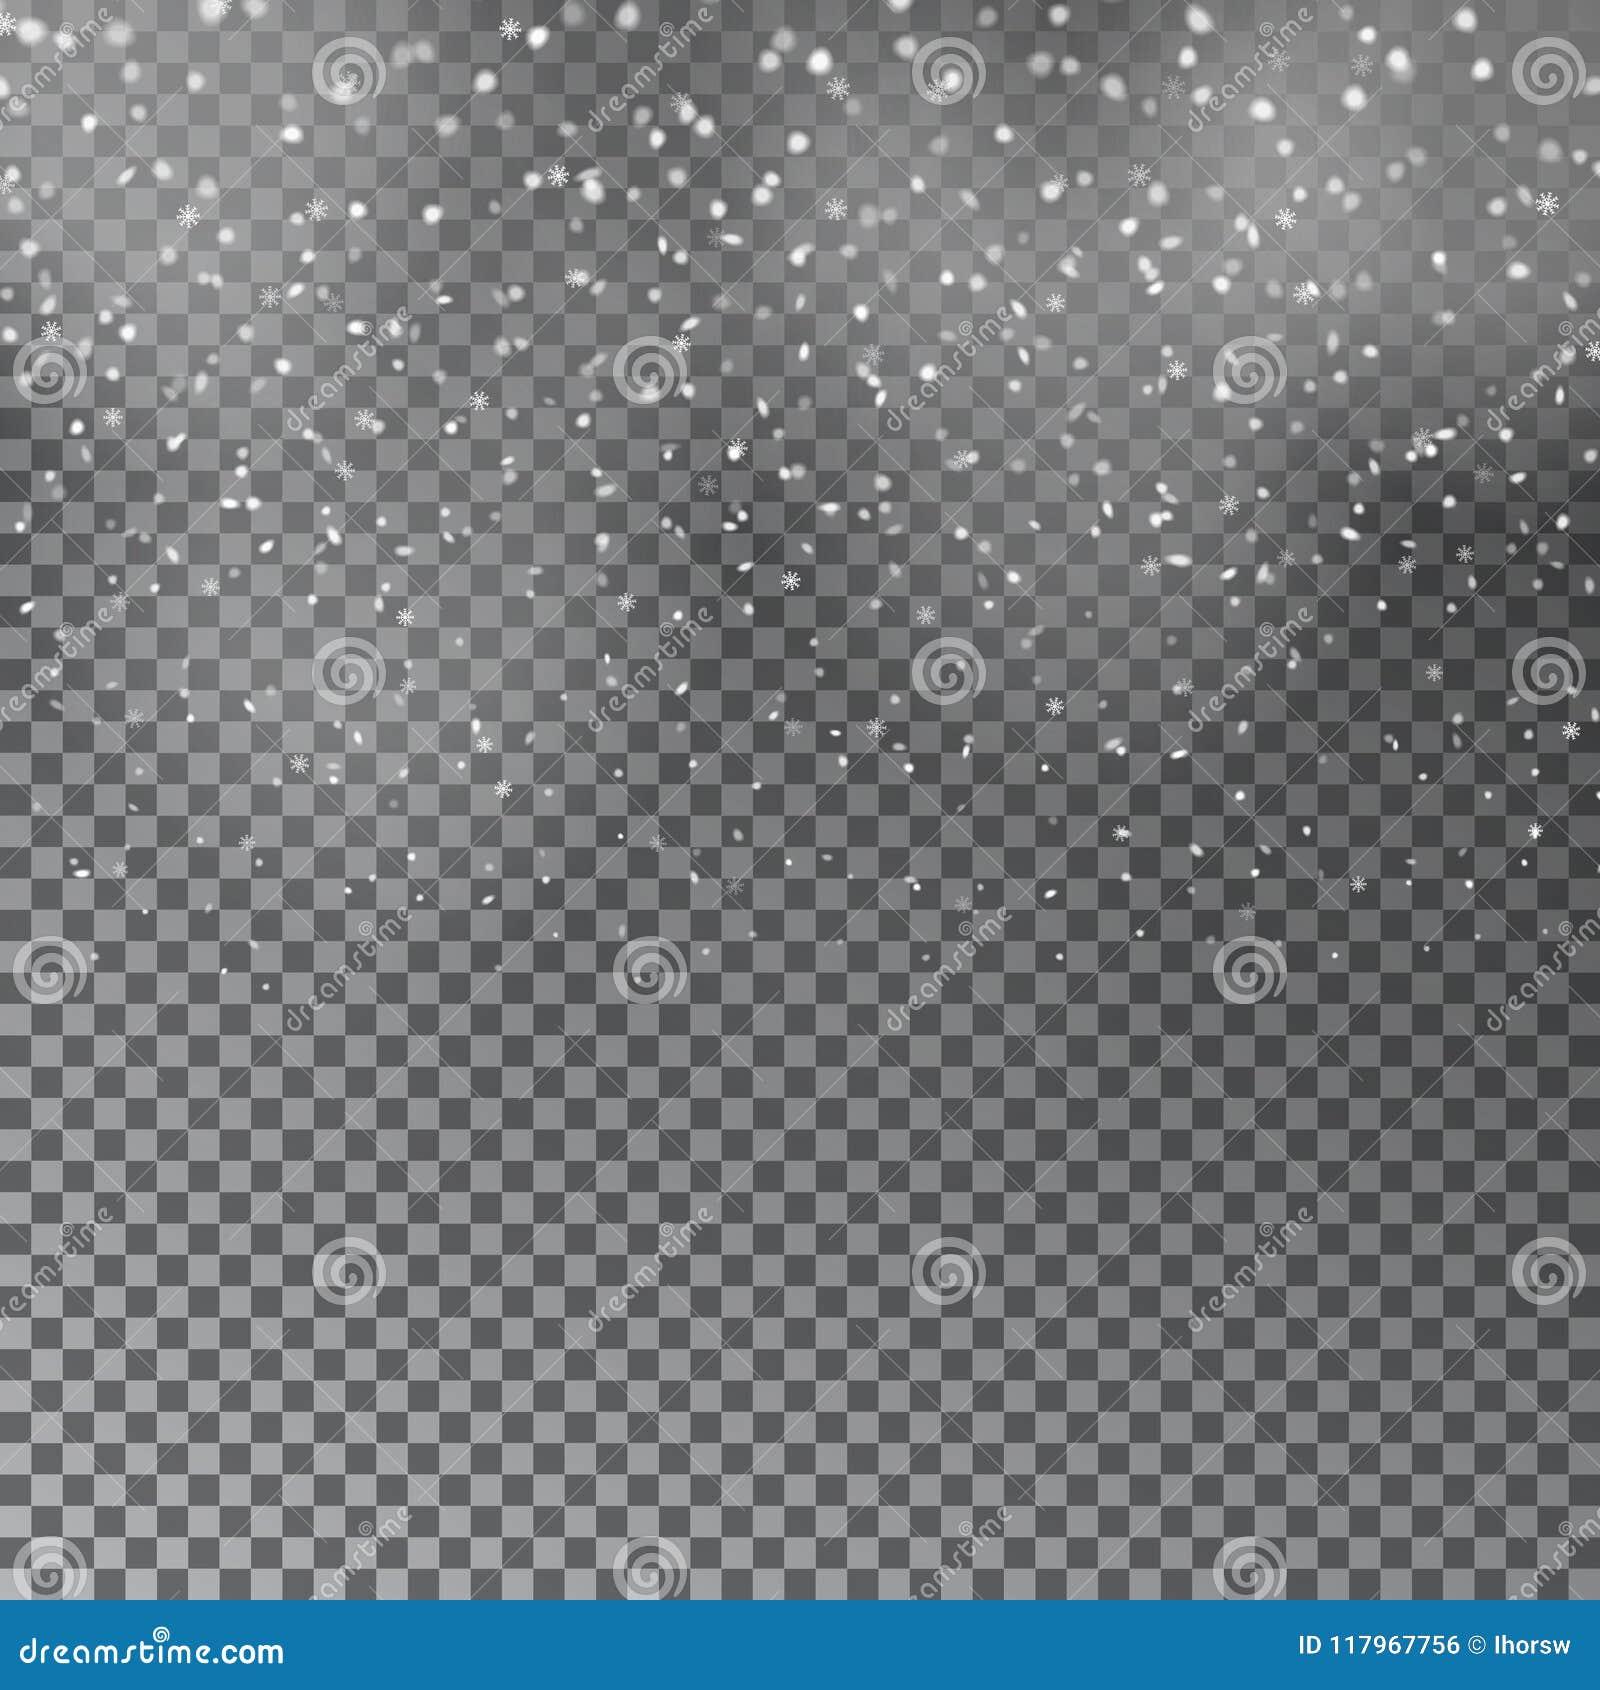 Dalende Kerstmis Glanzende transparante mooie sneeuw die op transparante achtergrond wordt geïsoleerd Sneeuwvlokken